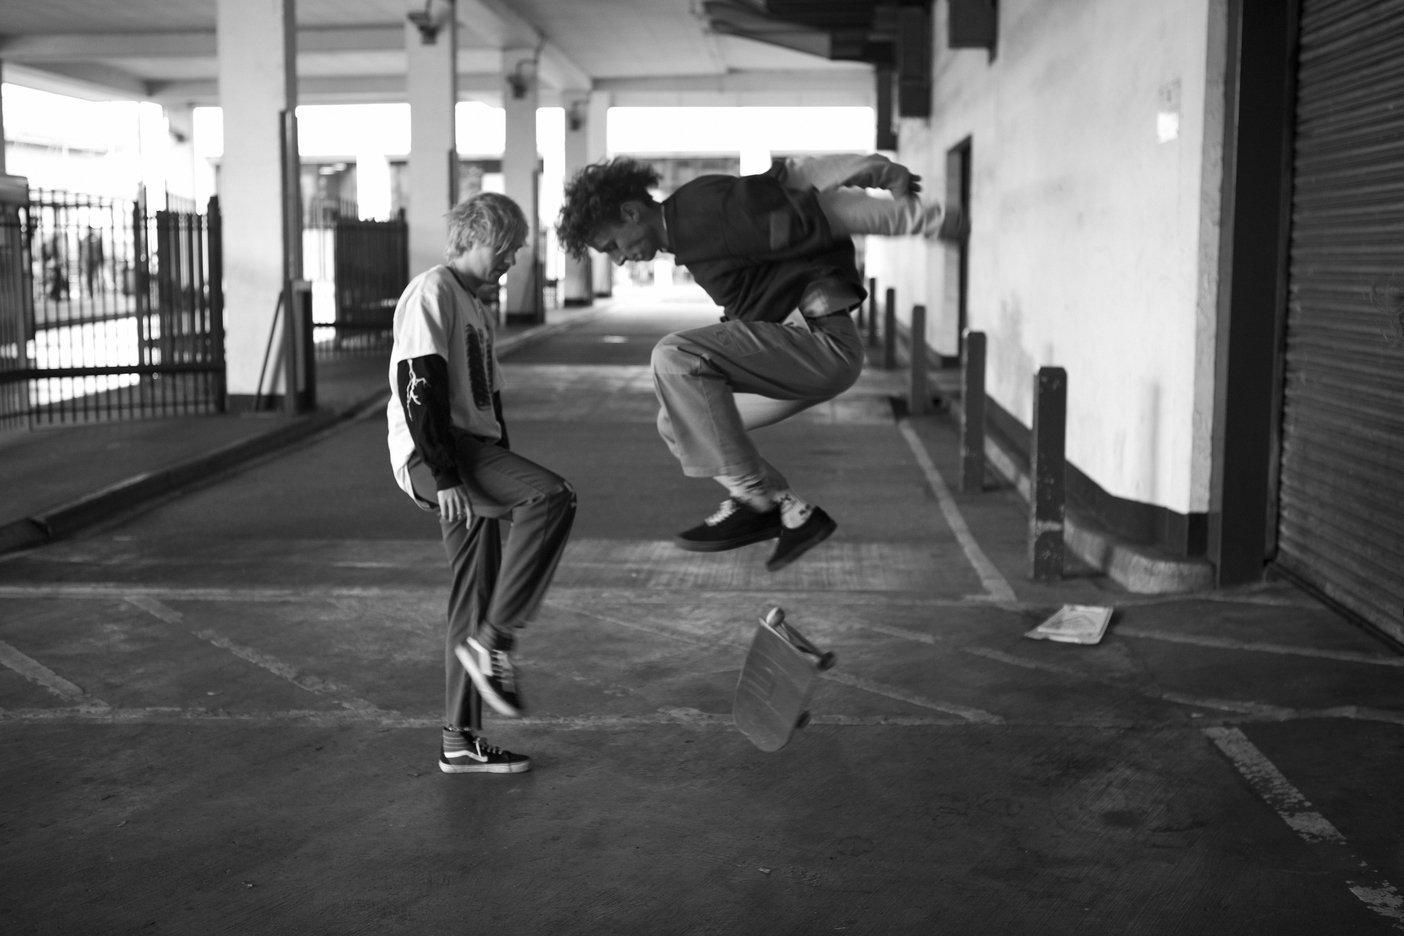 skating with Rat Boy